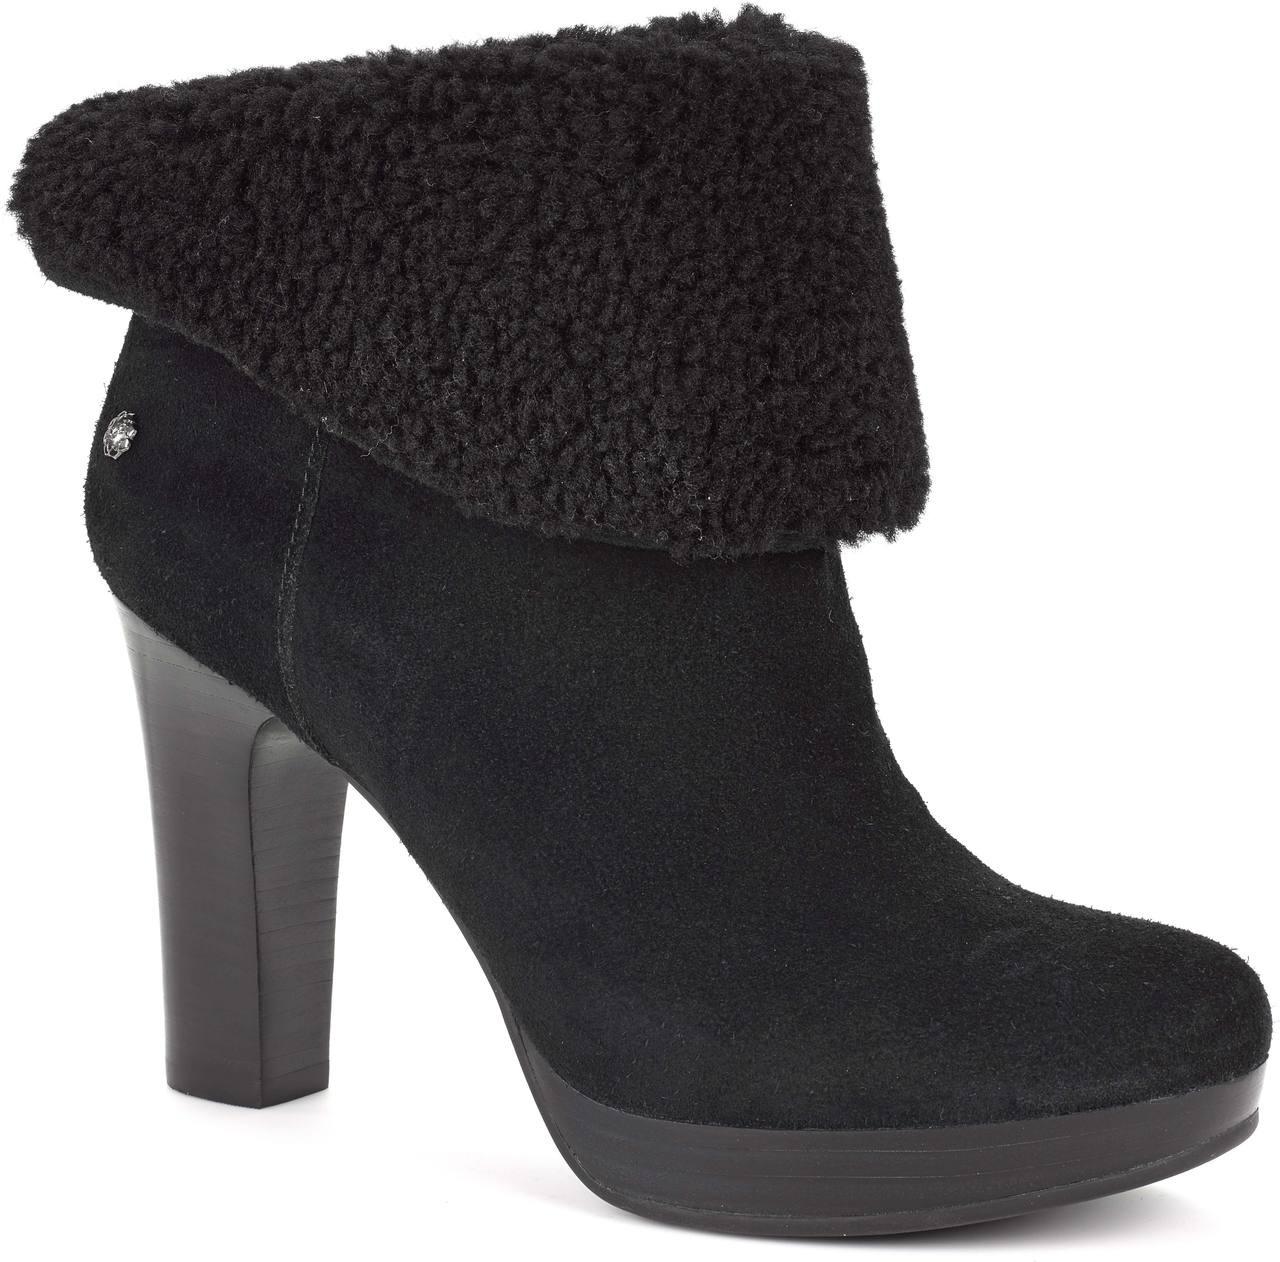 8884b1429ab Ugg Australia Dandylion Block Heel Ankle Boots - cheap watches mgc ...